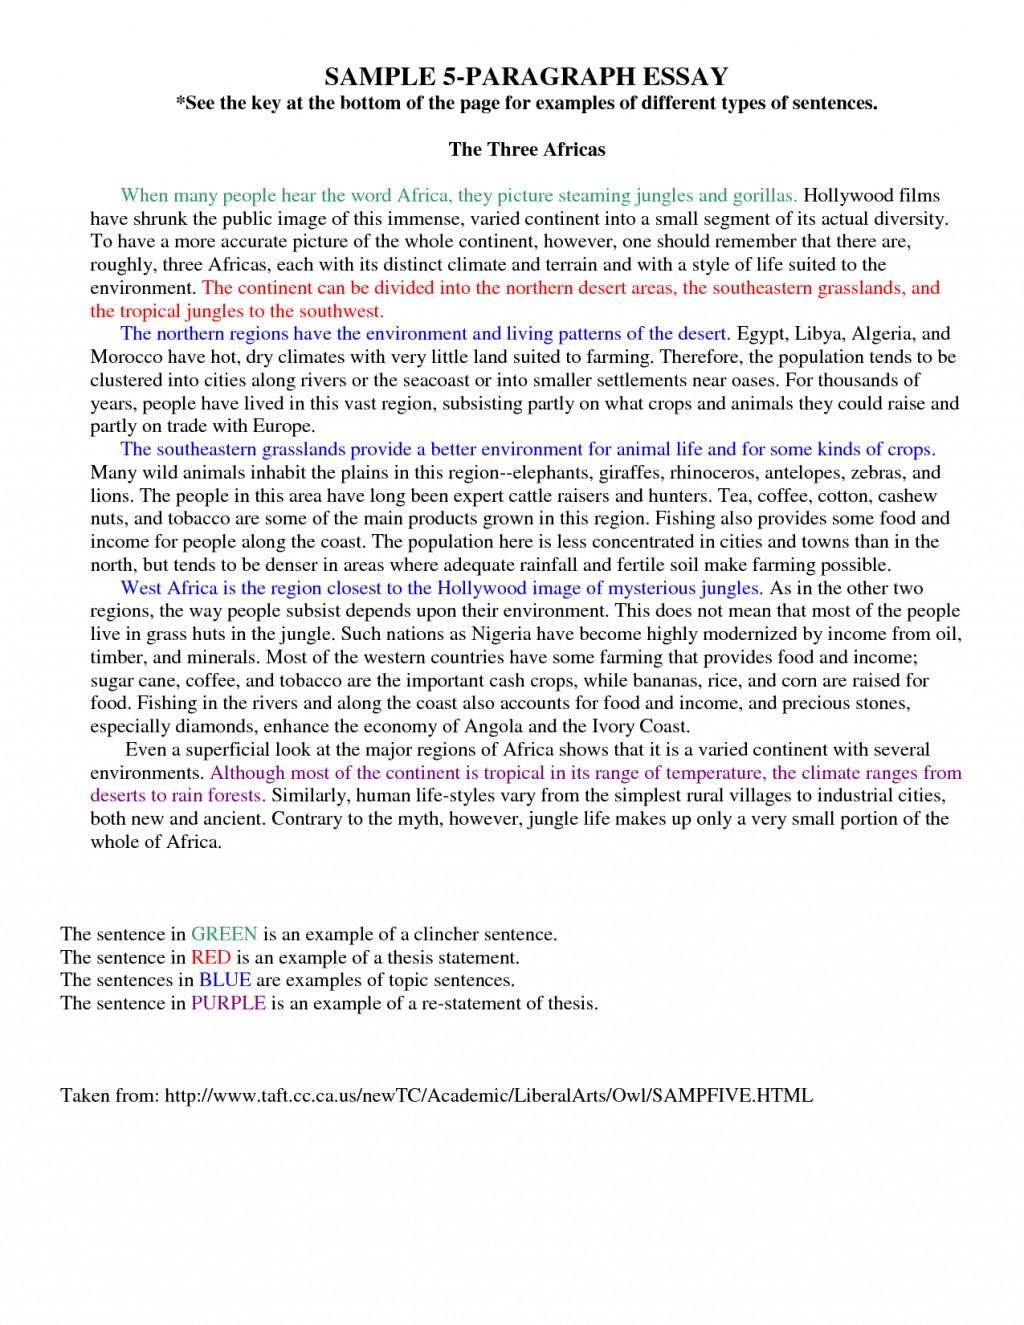 011 Essay Example Format Of Paragraph Sample Dicom Tester Cover Letter Stirring 5 Free Outline Template Printable Argumentative Large